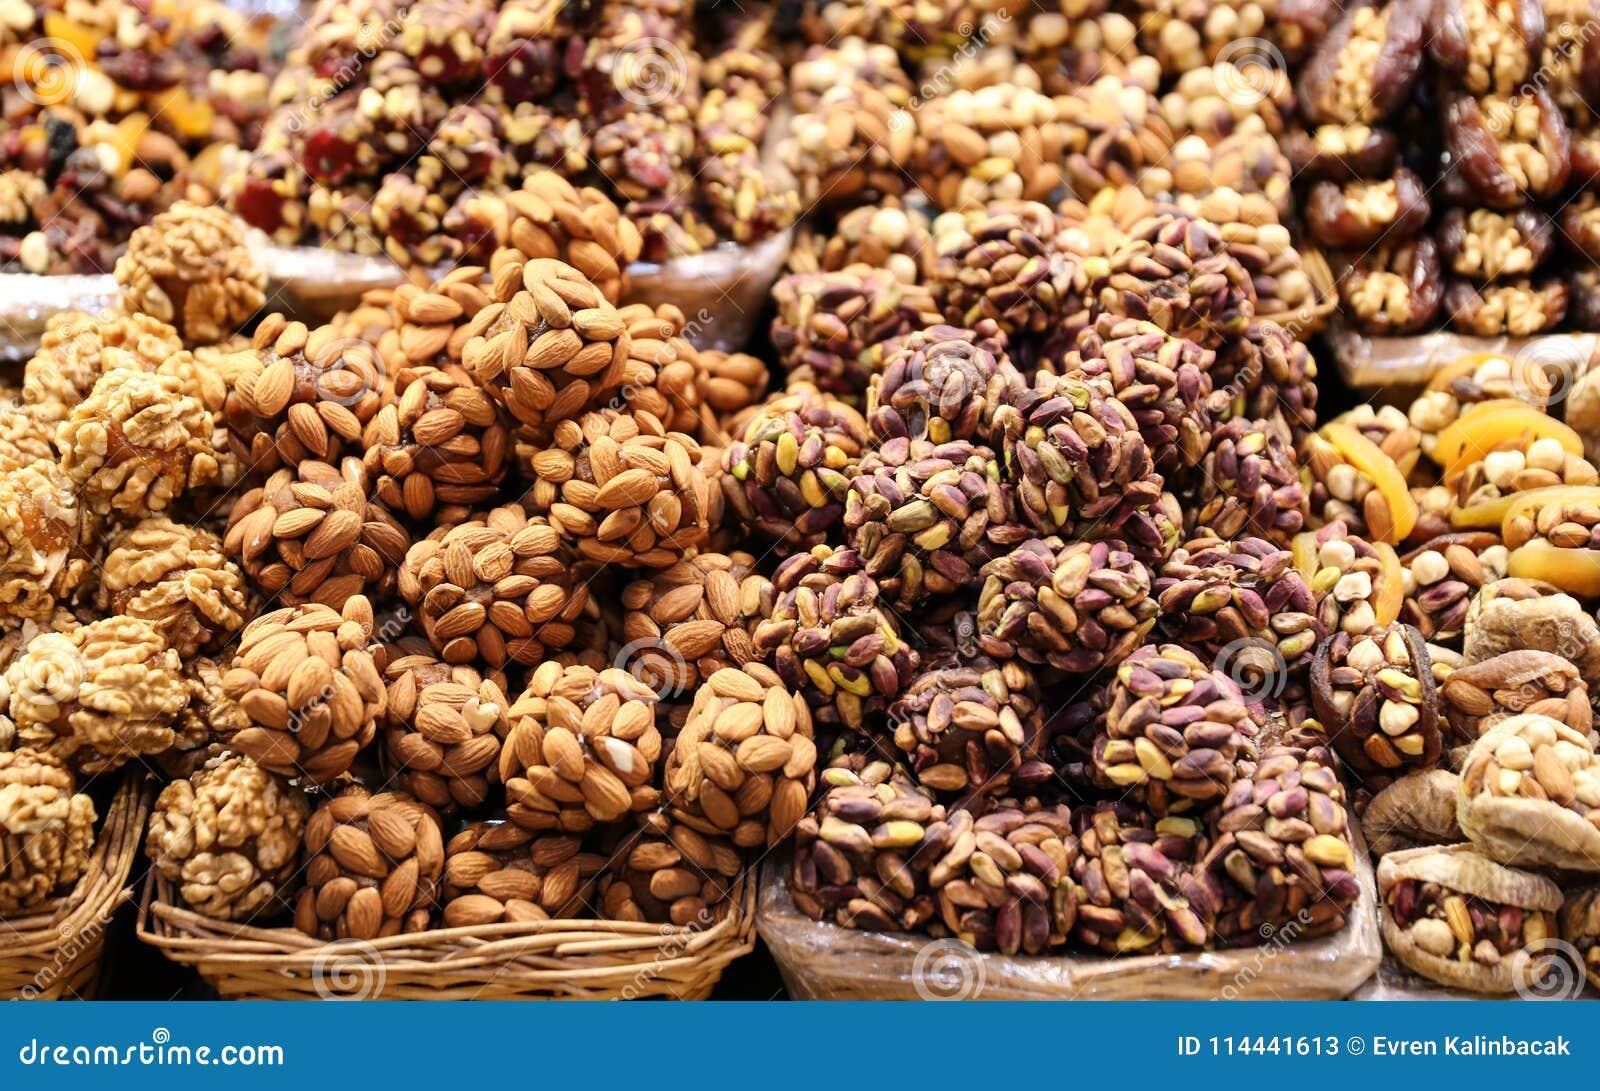 Turkish Sweets In Spice Bazaar, Istanbul, Turkey Stock Image - Image